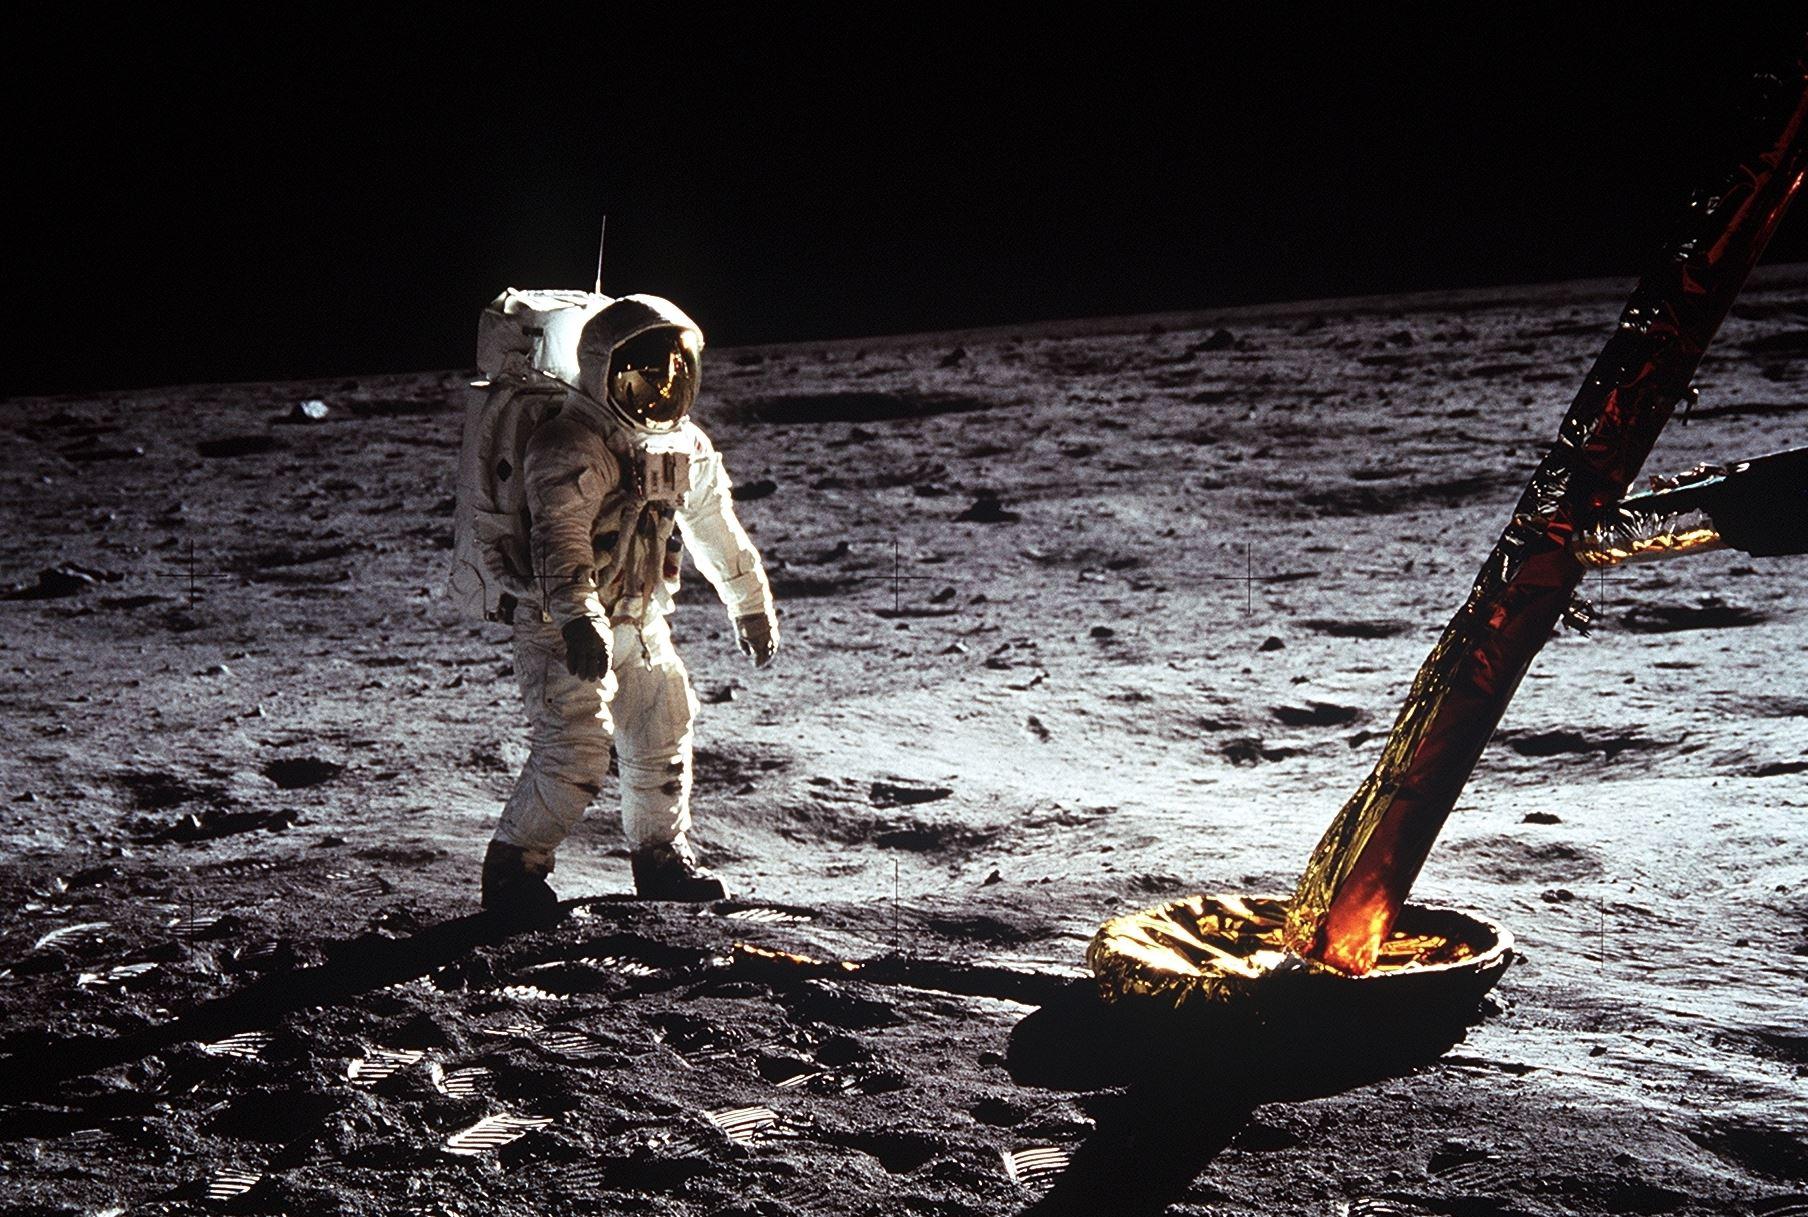 Astronaut Buzz Aldrin walks on the surface of the Moon near a leg of the lunar module during Apollo 11.- Image Credit: NASA